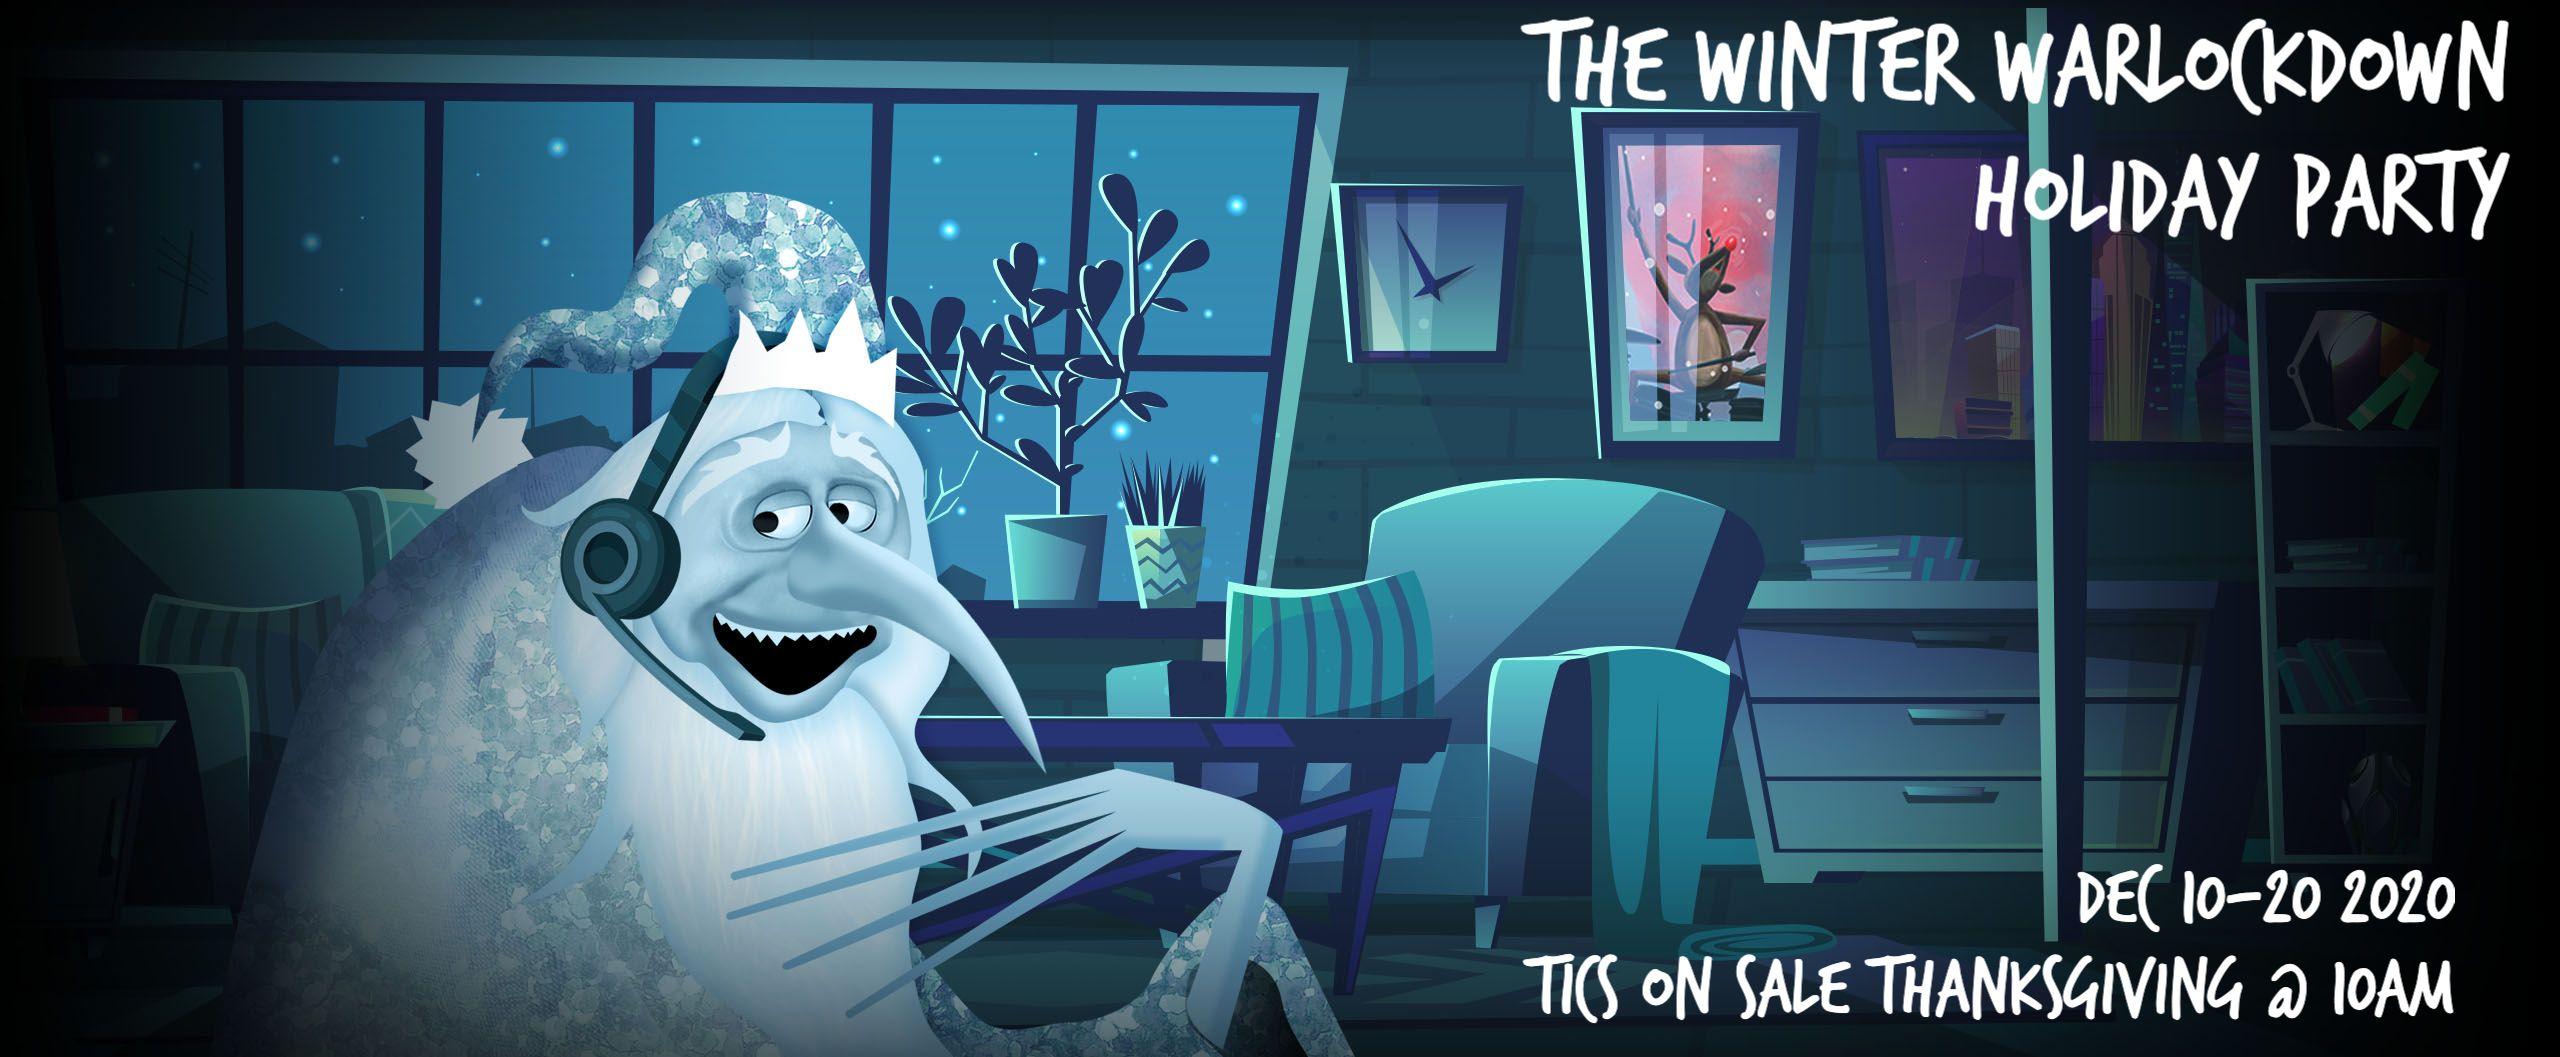 The Winter War Lockdown - The Troubies - The Troubadour